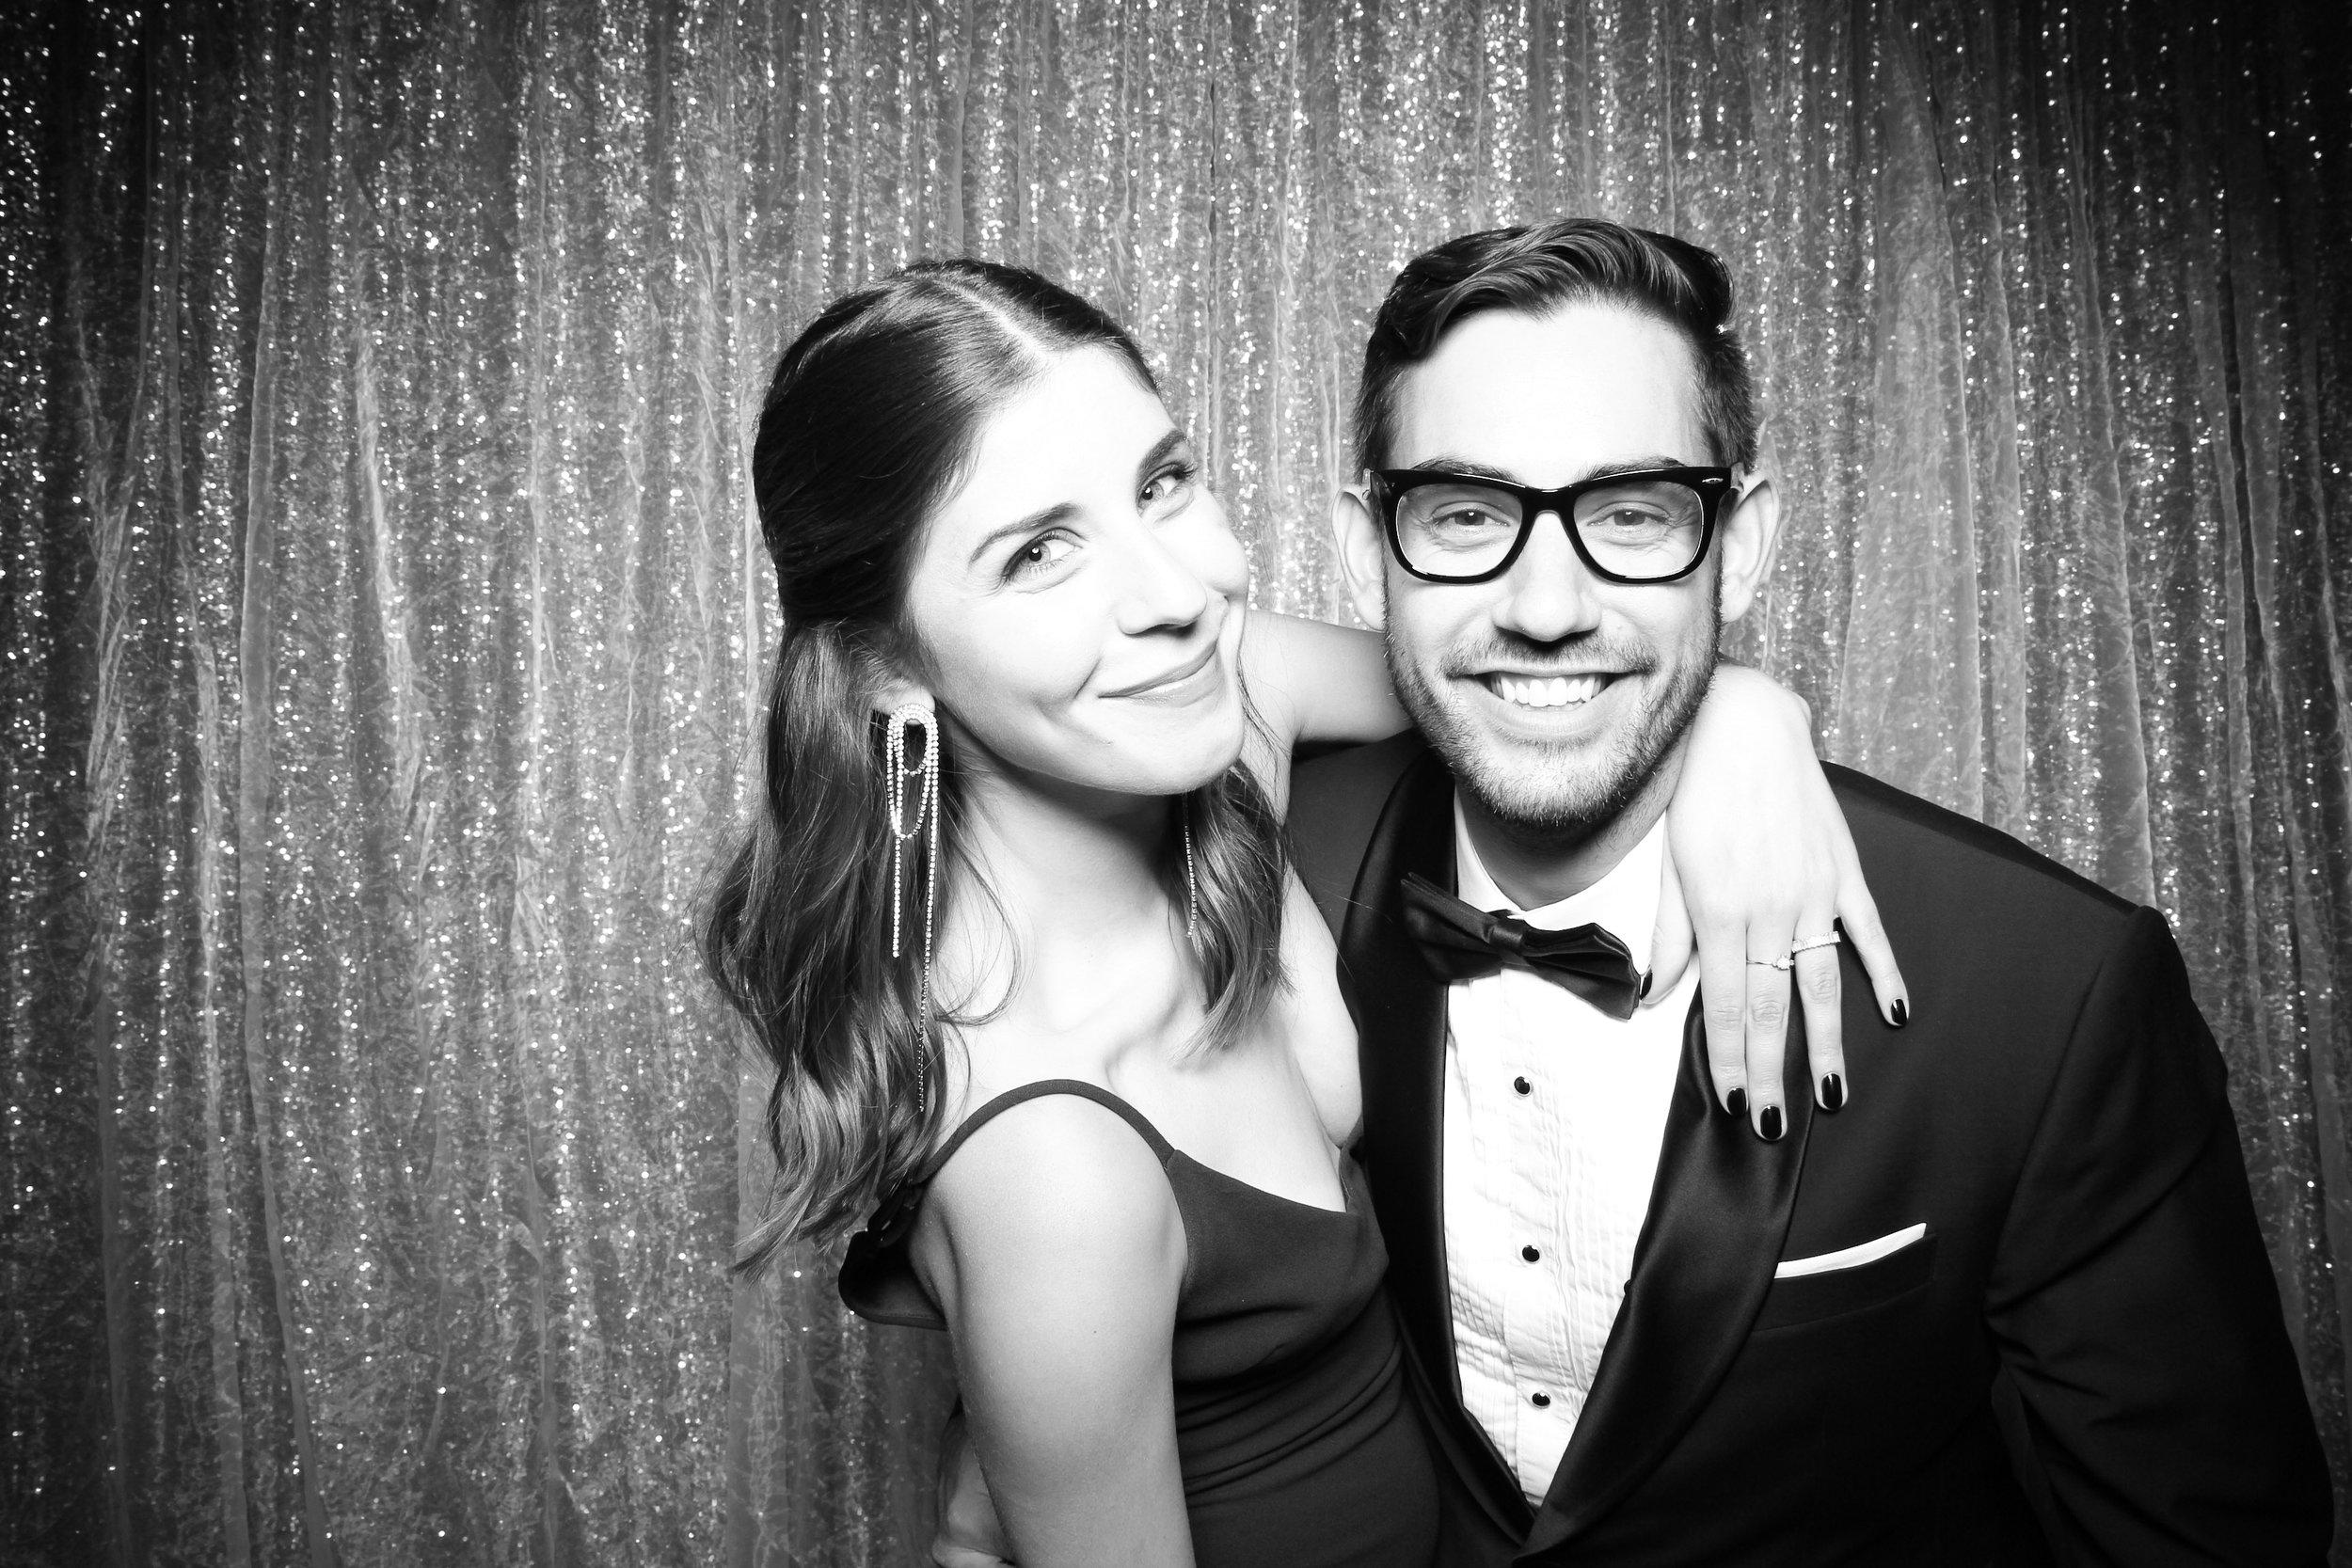 JW_Marriott_Burnham_Ballroom_Wedding_Photo_Booth_11.jpg